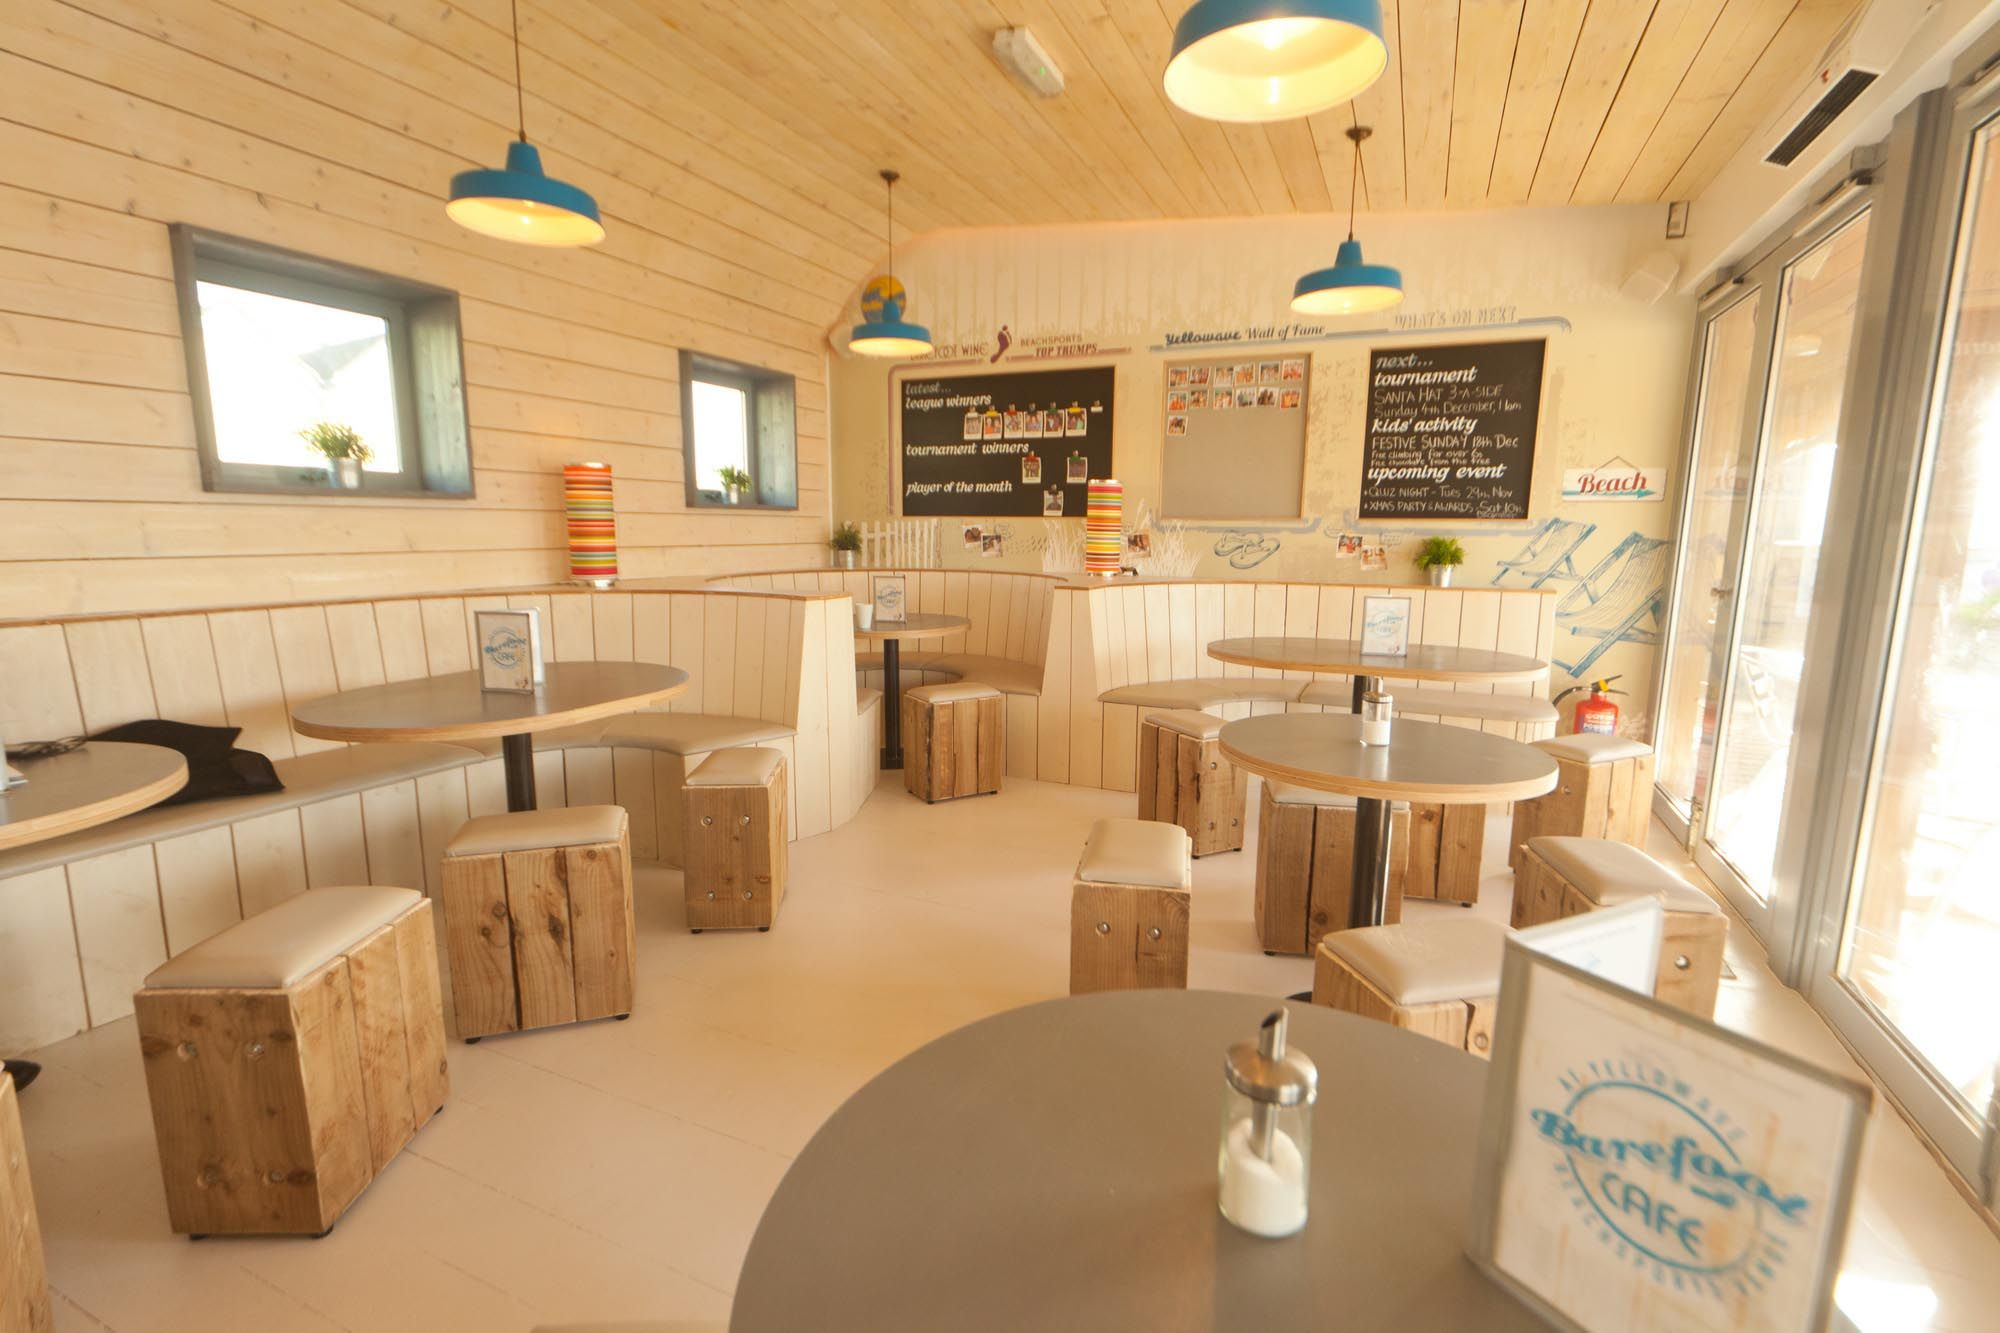 beach cafe interior - google search | beach cafe inspiration